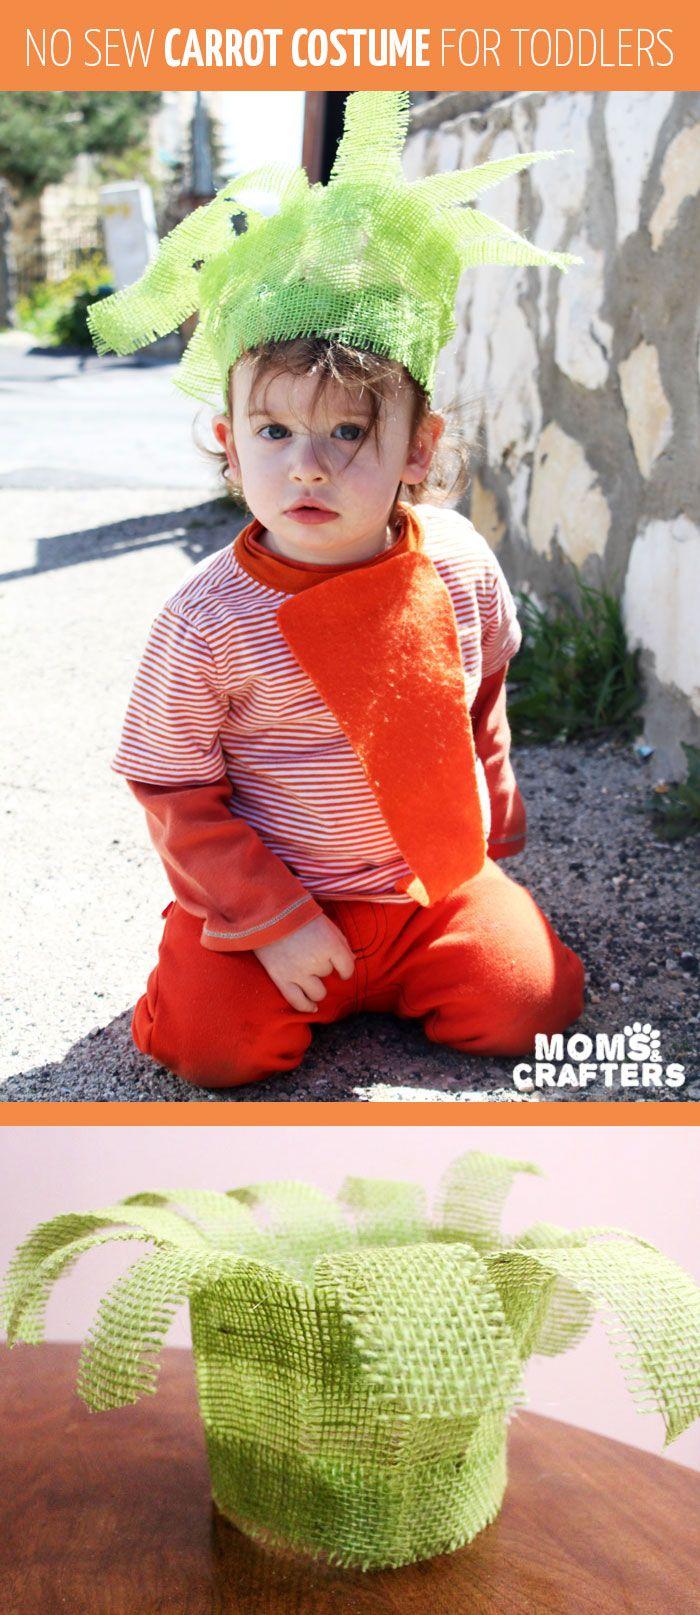 Make an adorable unisex no-sew carrot costume | DIY ideas ...